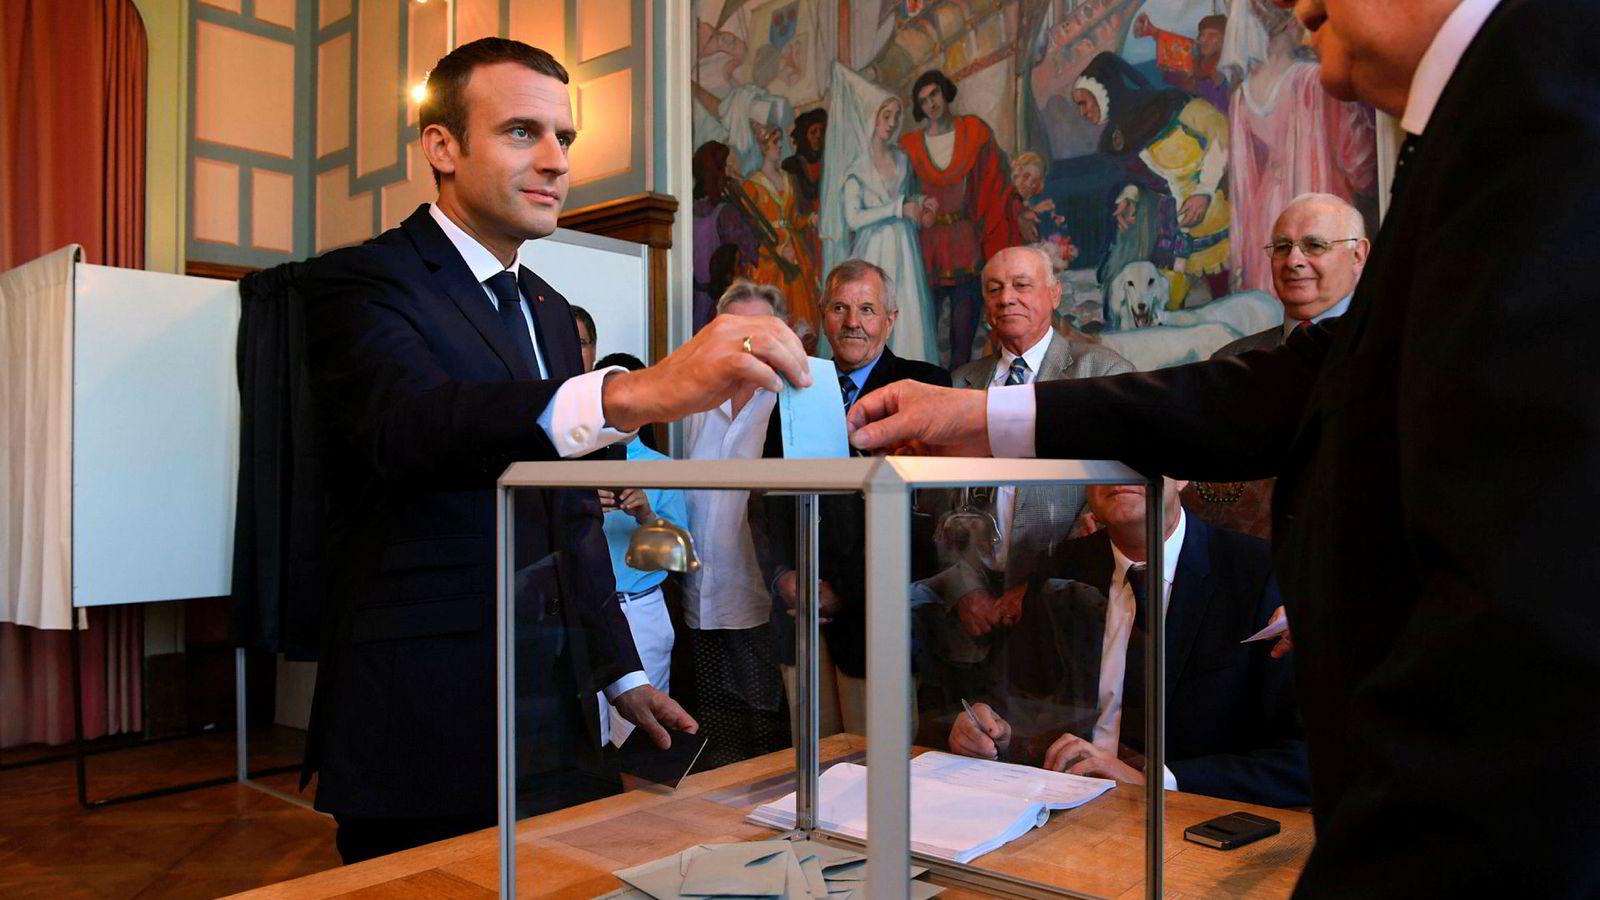 Frankrikes president Emmanuel Macron avla søndag sin stemme i Le Touquet, Frankrike, i det franske valget.